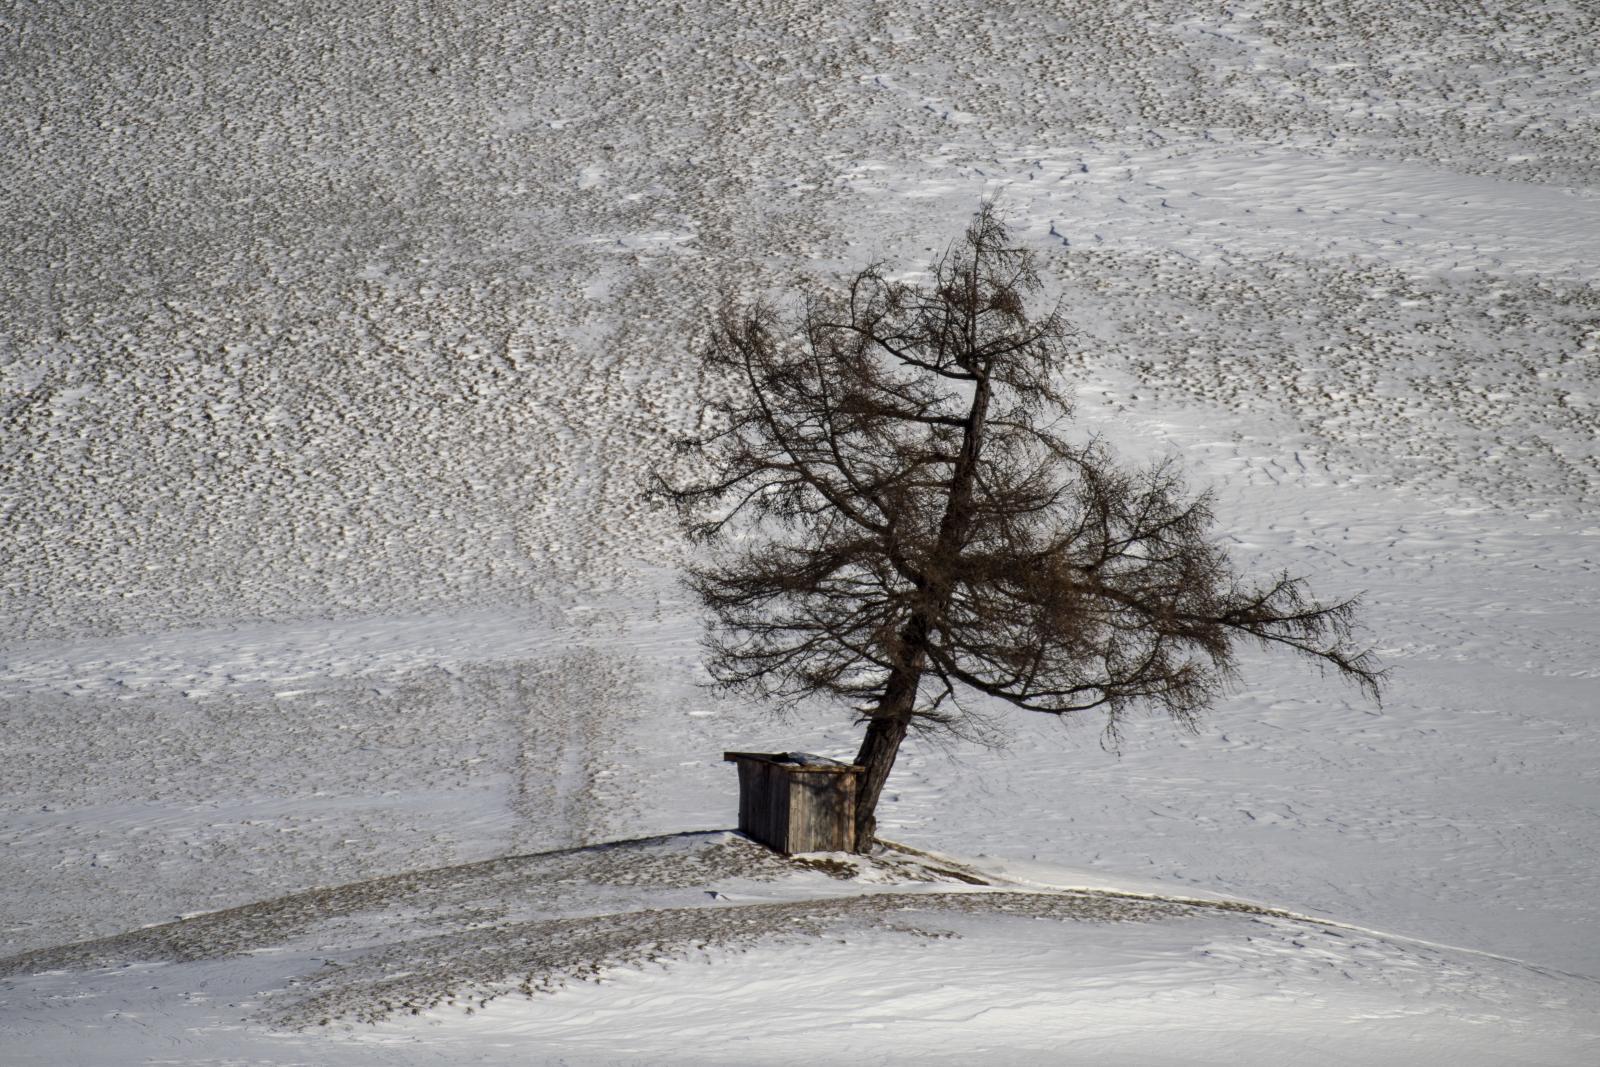 Zima w Austrii. Fot. PAP/EPA/CHRISTIAN BRUNA